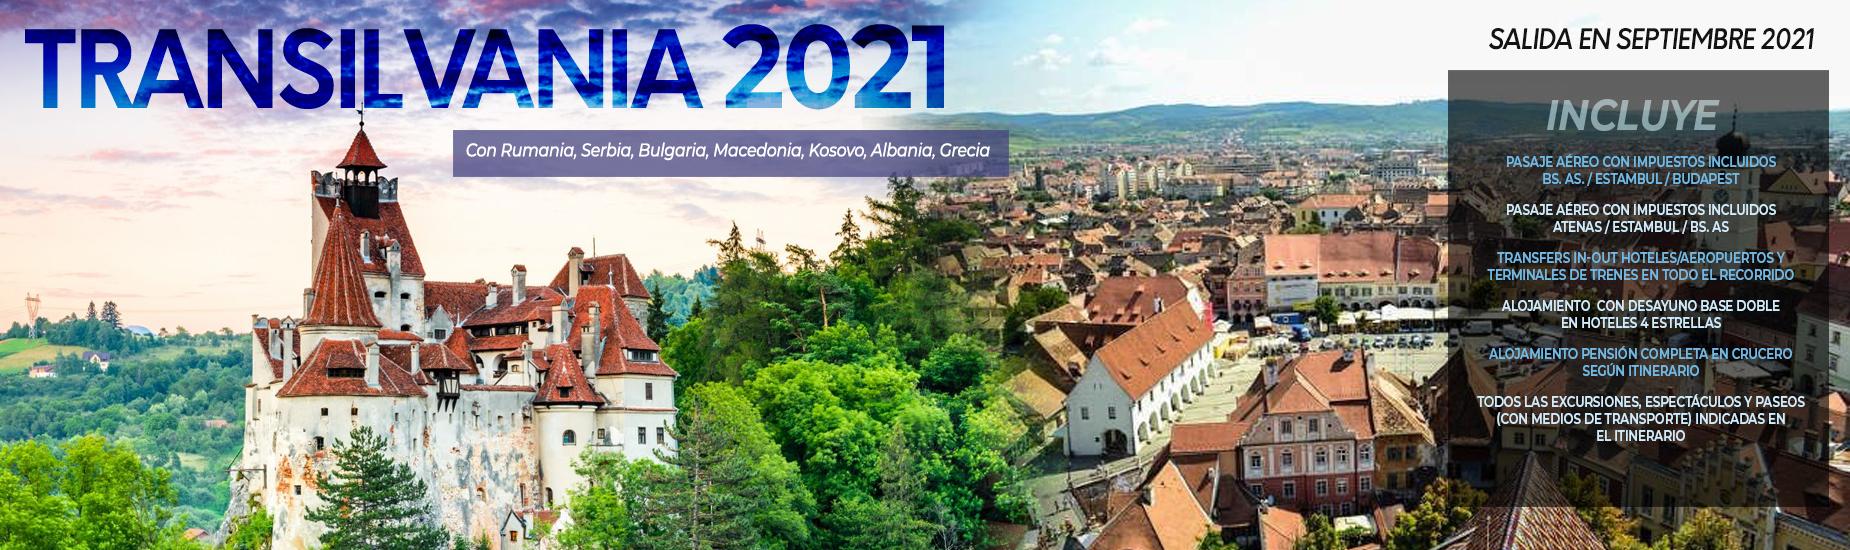 Viajes 2021 - TRANSILVANIA